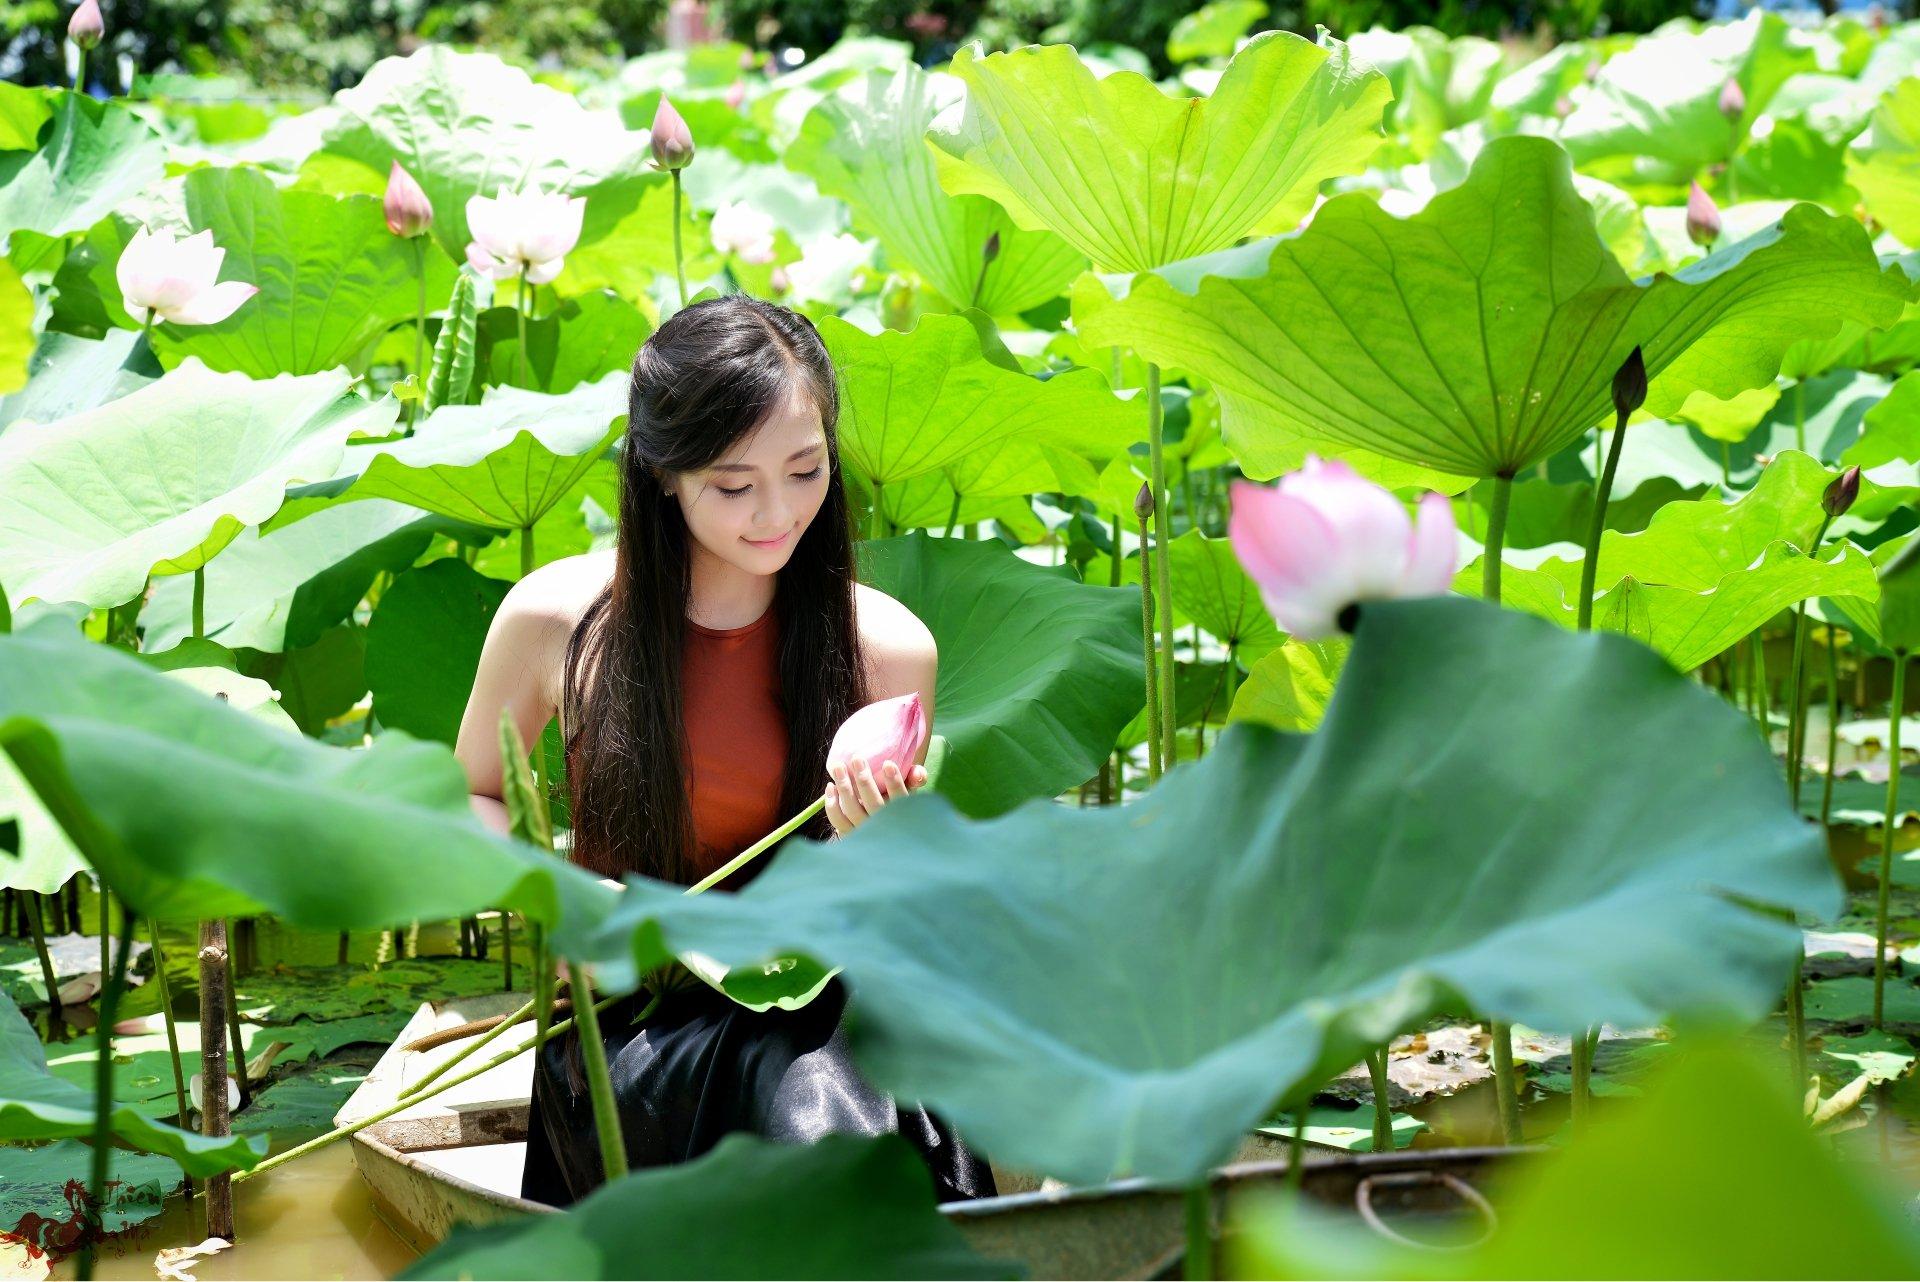 Iphone 5 Asian Girl Wallpaper Asian 5k Retina Ultra Hd Wallpaper And Background Image